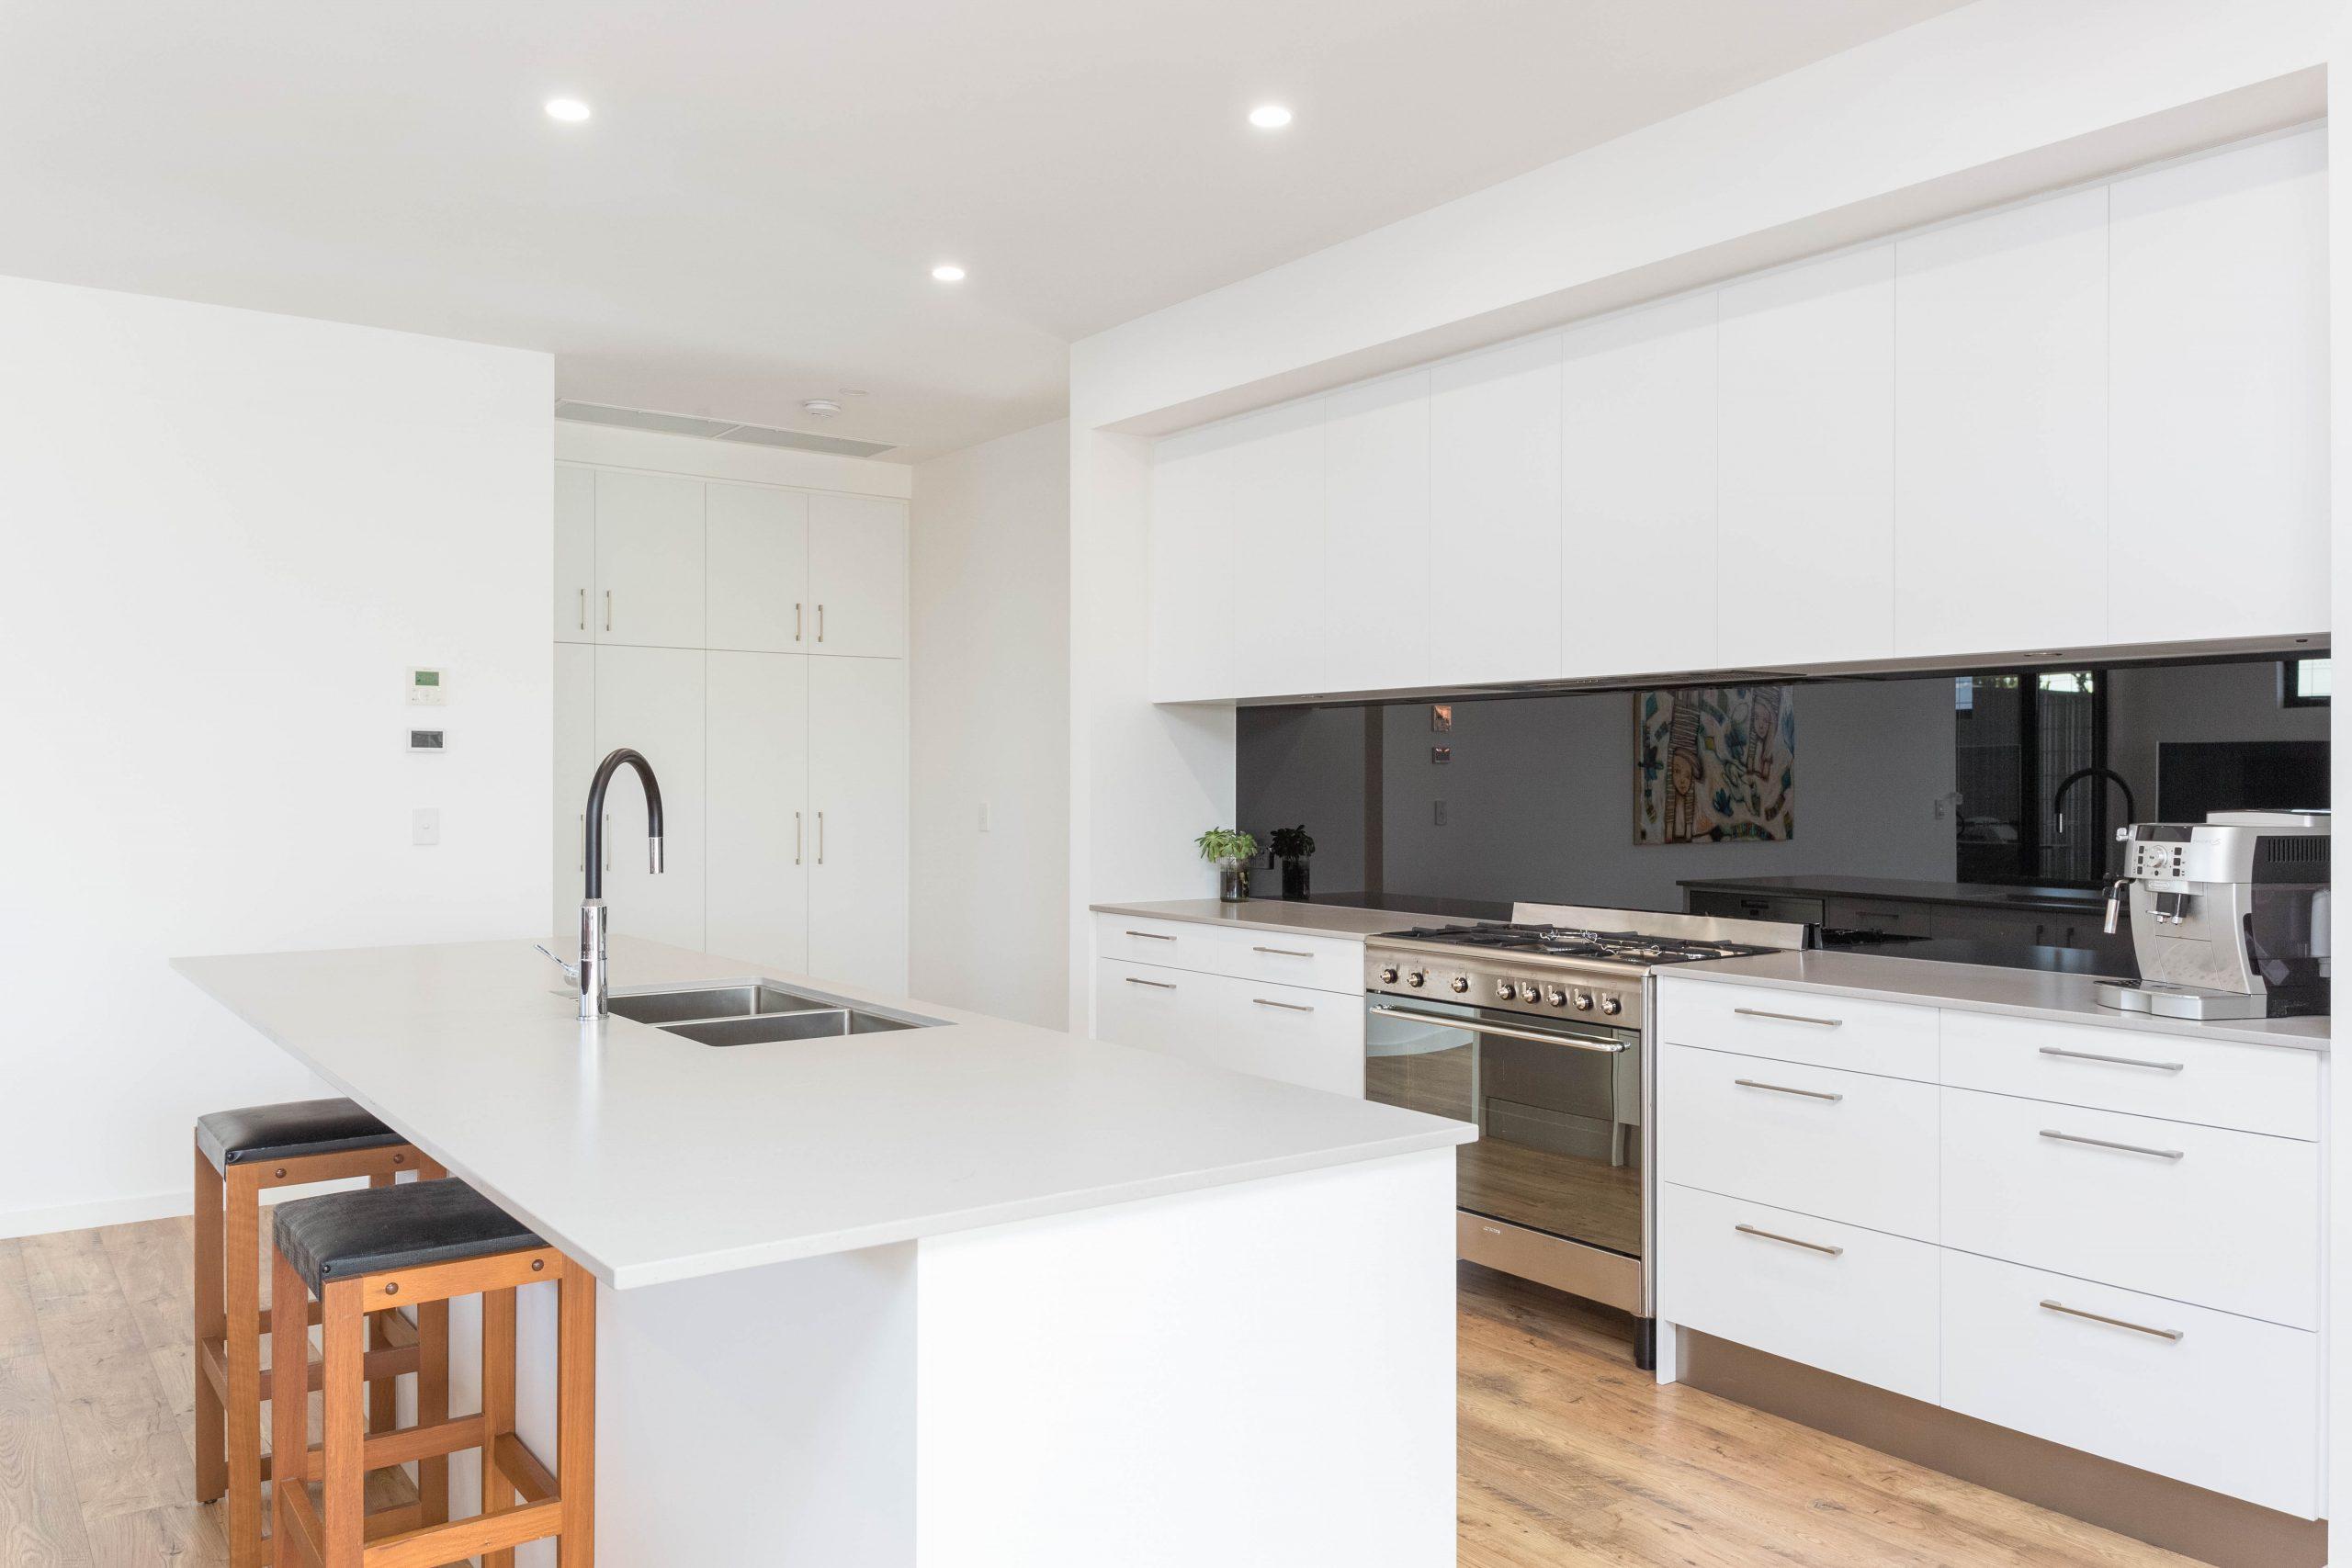 Custom Home, New Home, Single Storey Home, Builders, Design, Port Elliot, Fleurieu, Kitchen, Gas Stove Top, Splashback, Modern